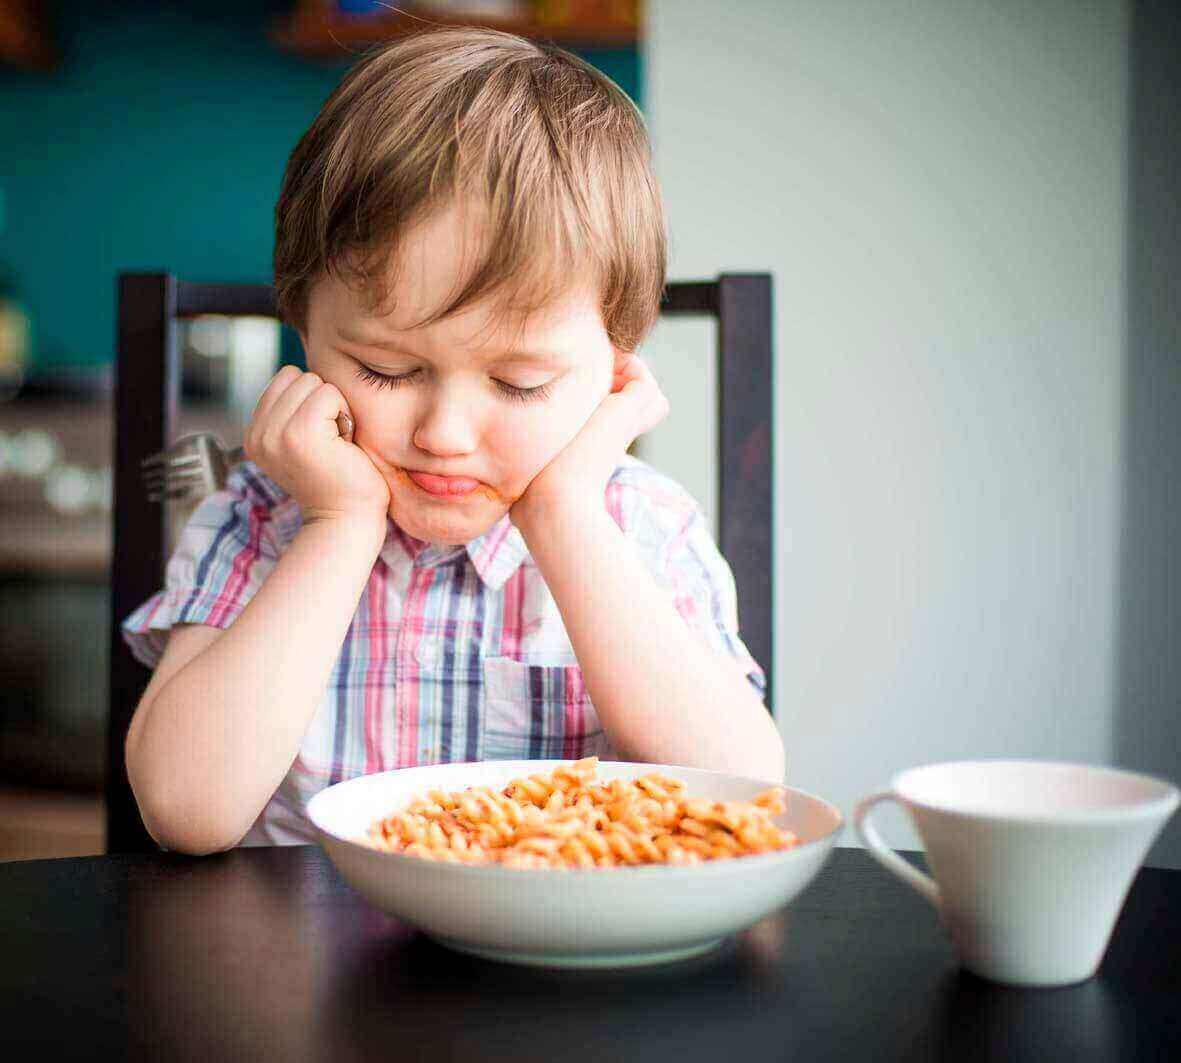 comida-no-sana-para-niños